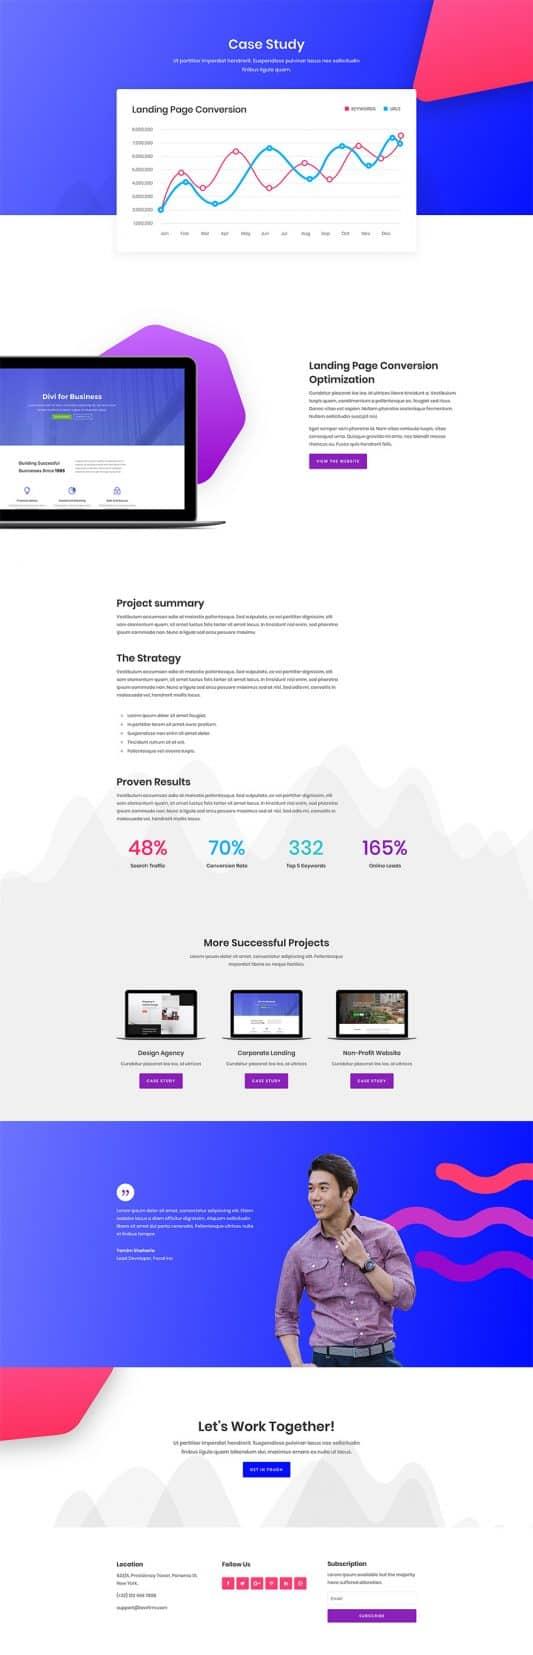 SEO Agency Web Design 3